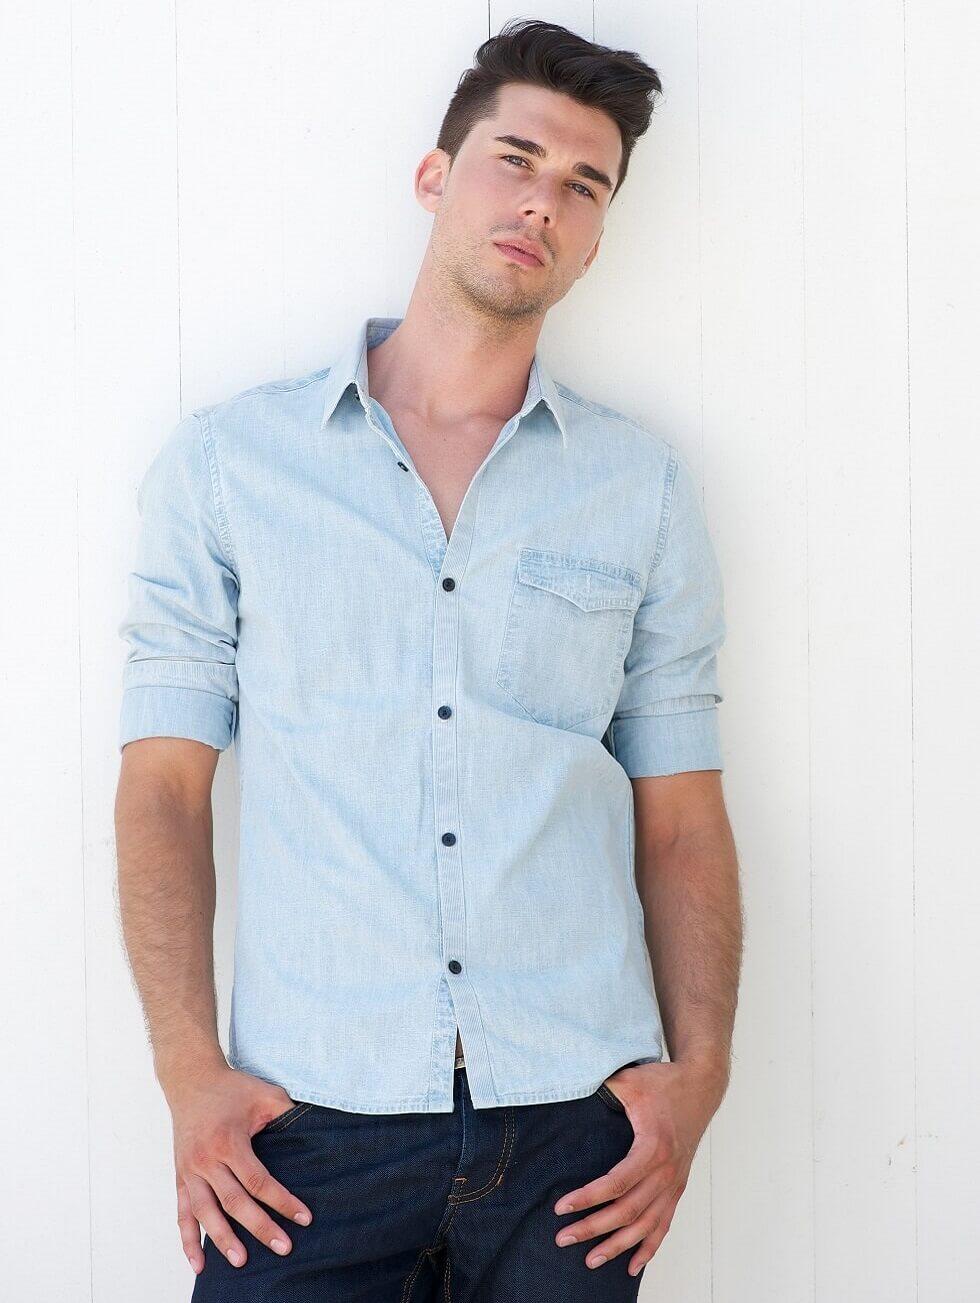 Blue Men Shirt Image 03